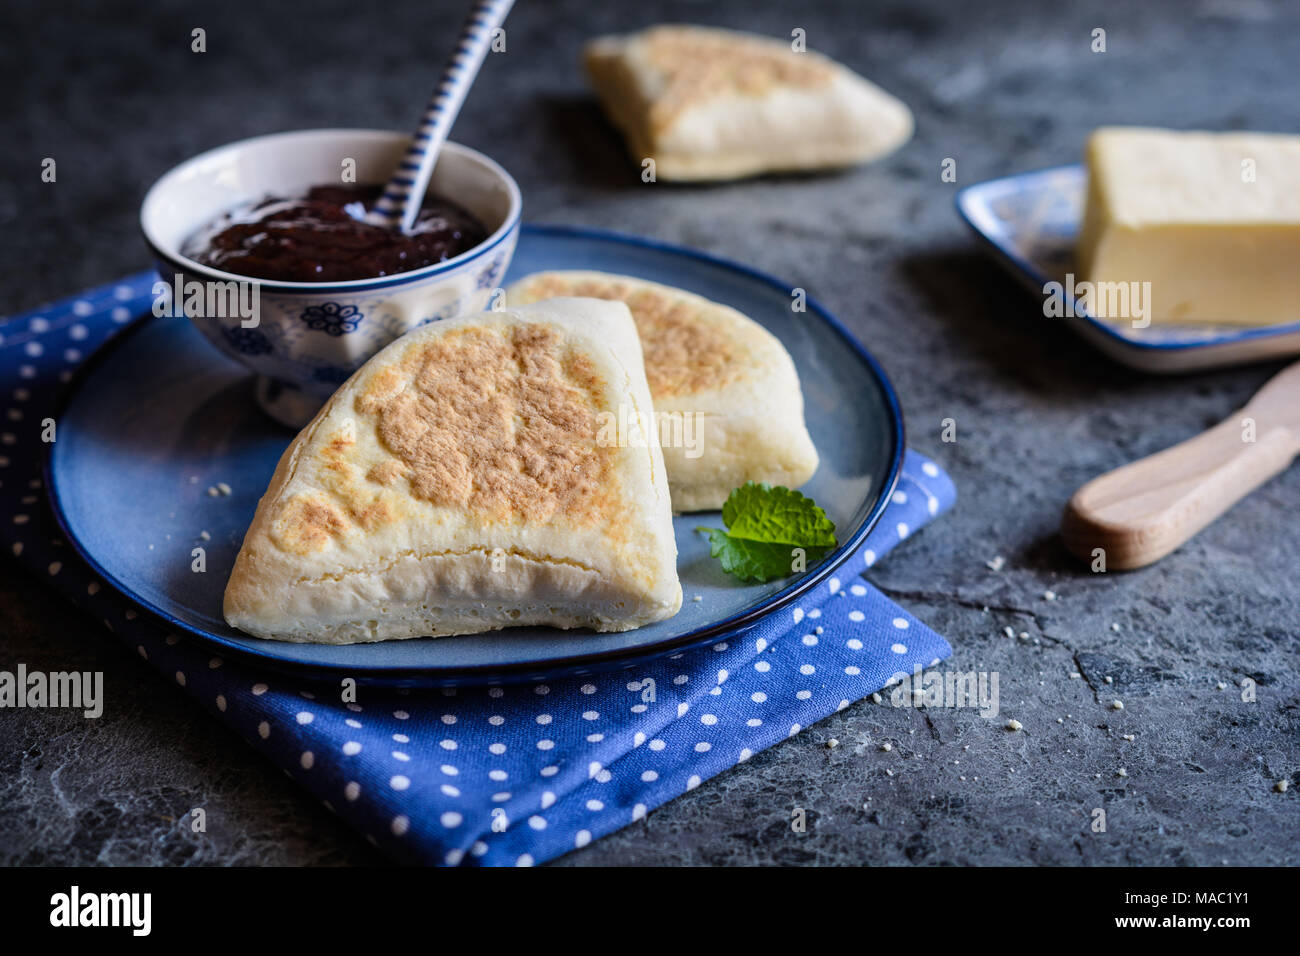 Irish Soda Farls - traditional Irish flatbread served with jam - Stock Image